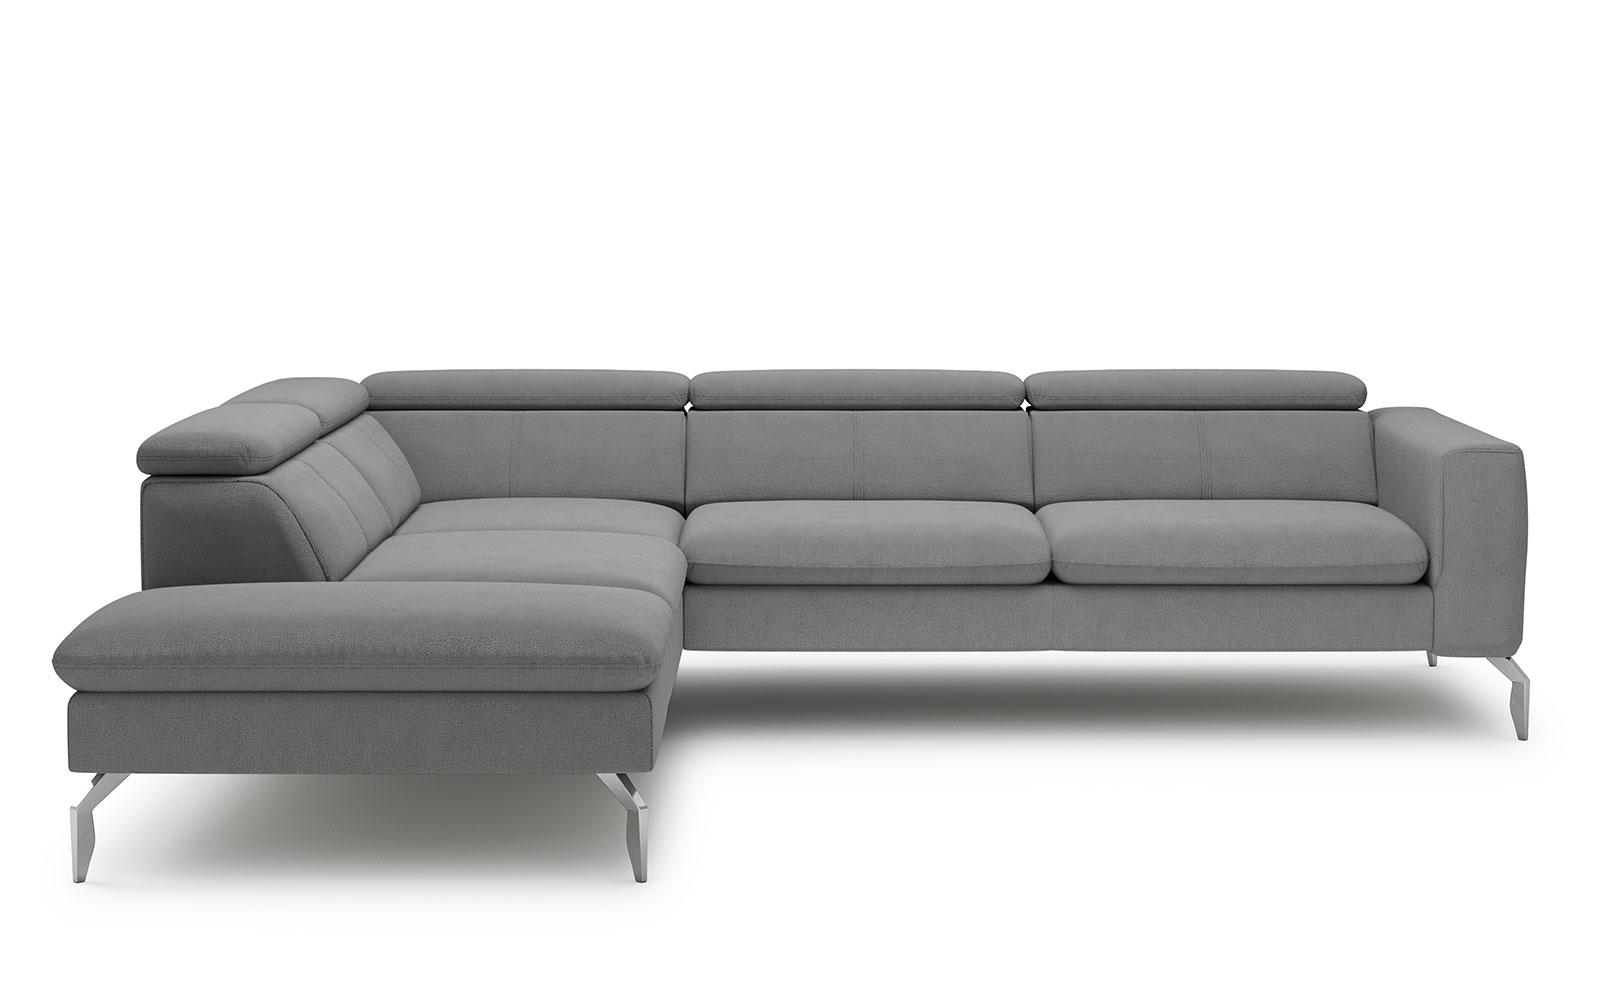 Arezza Corner Sofa - soft touch grey